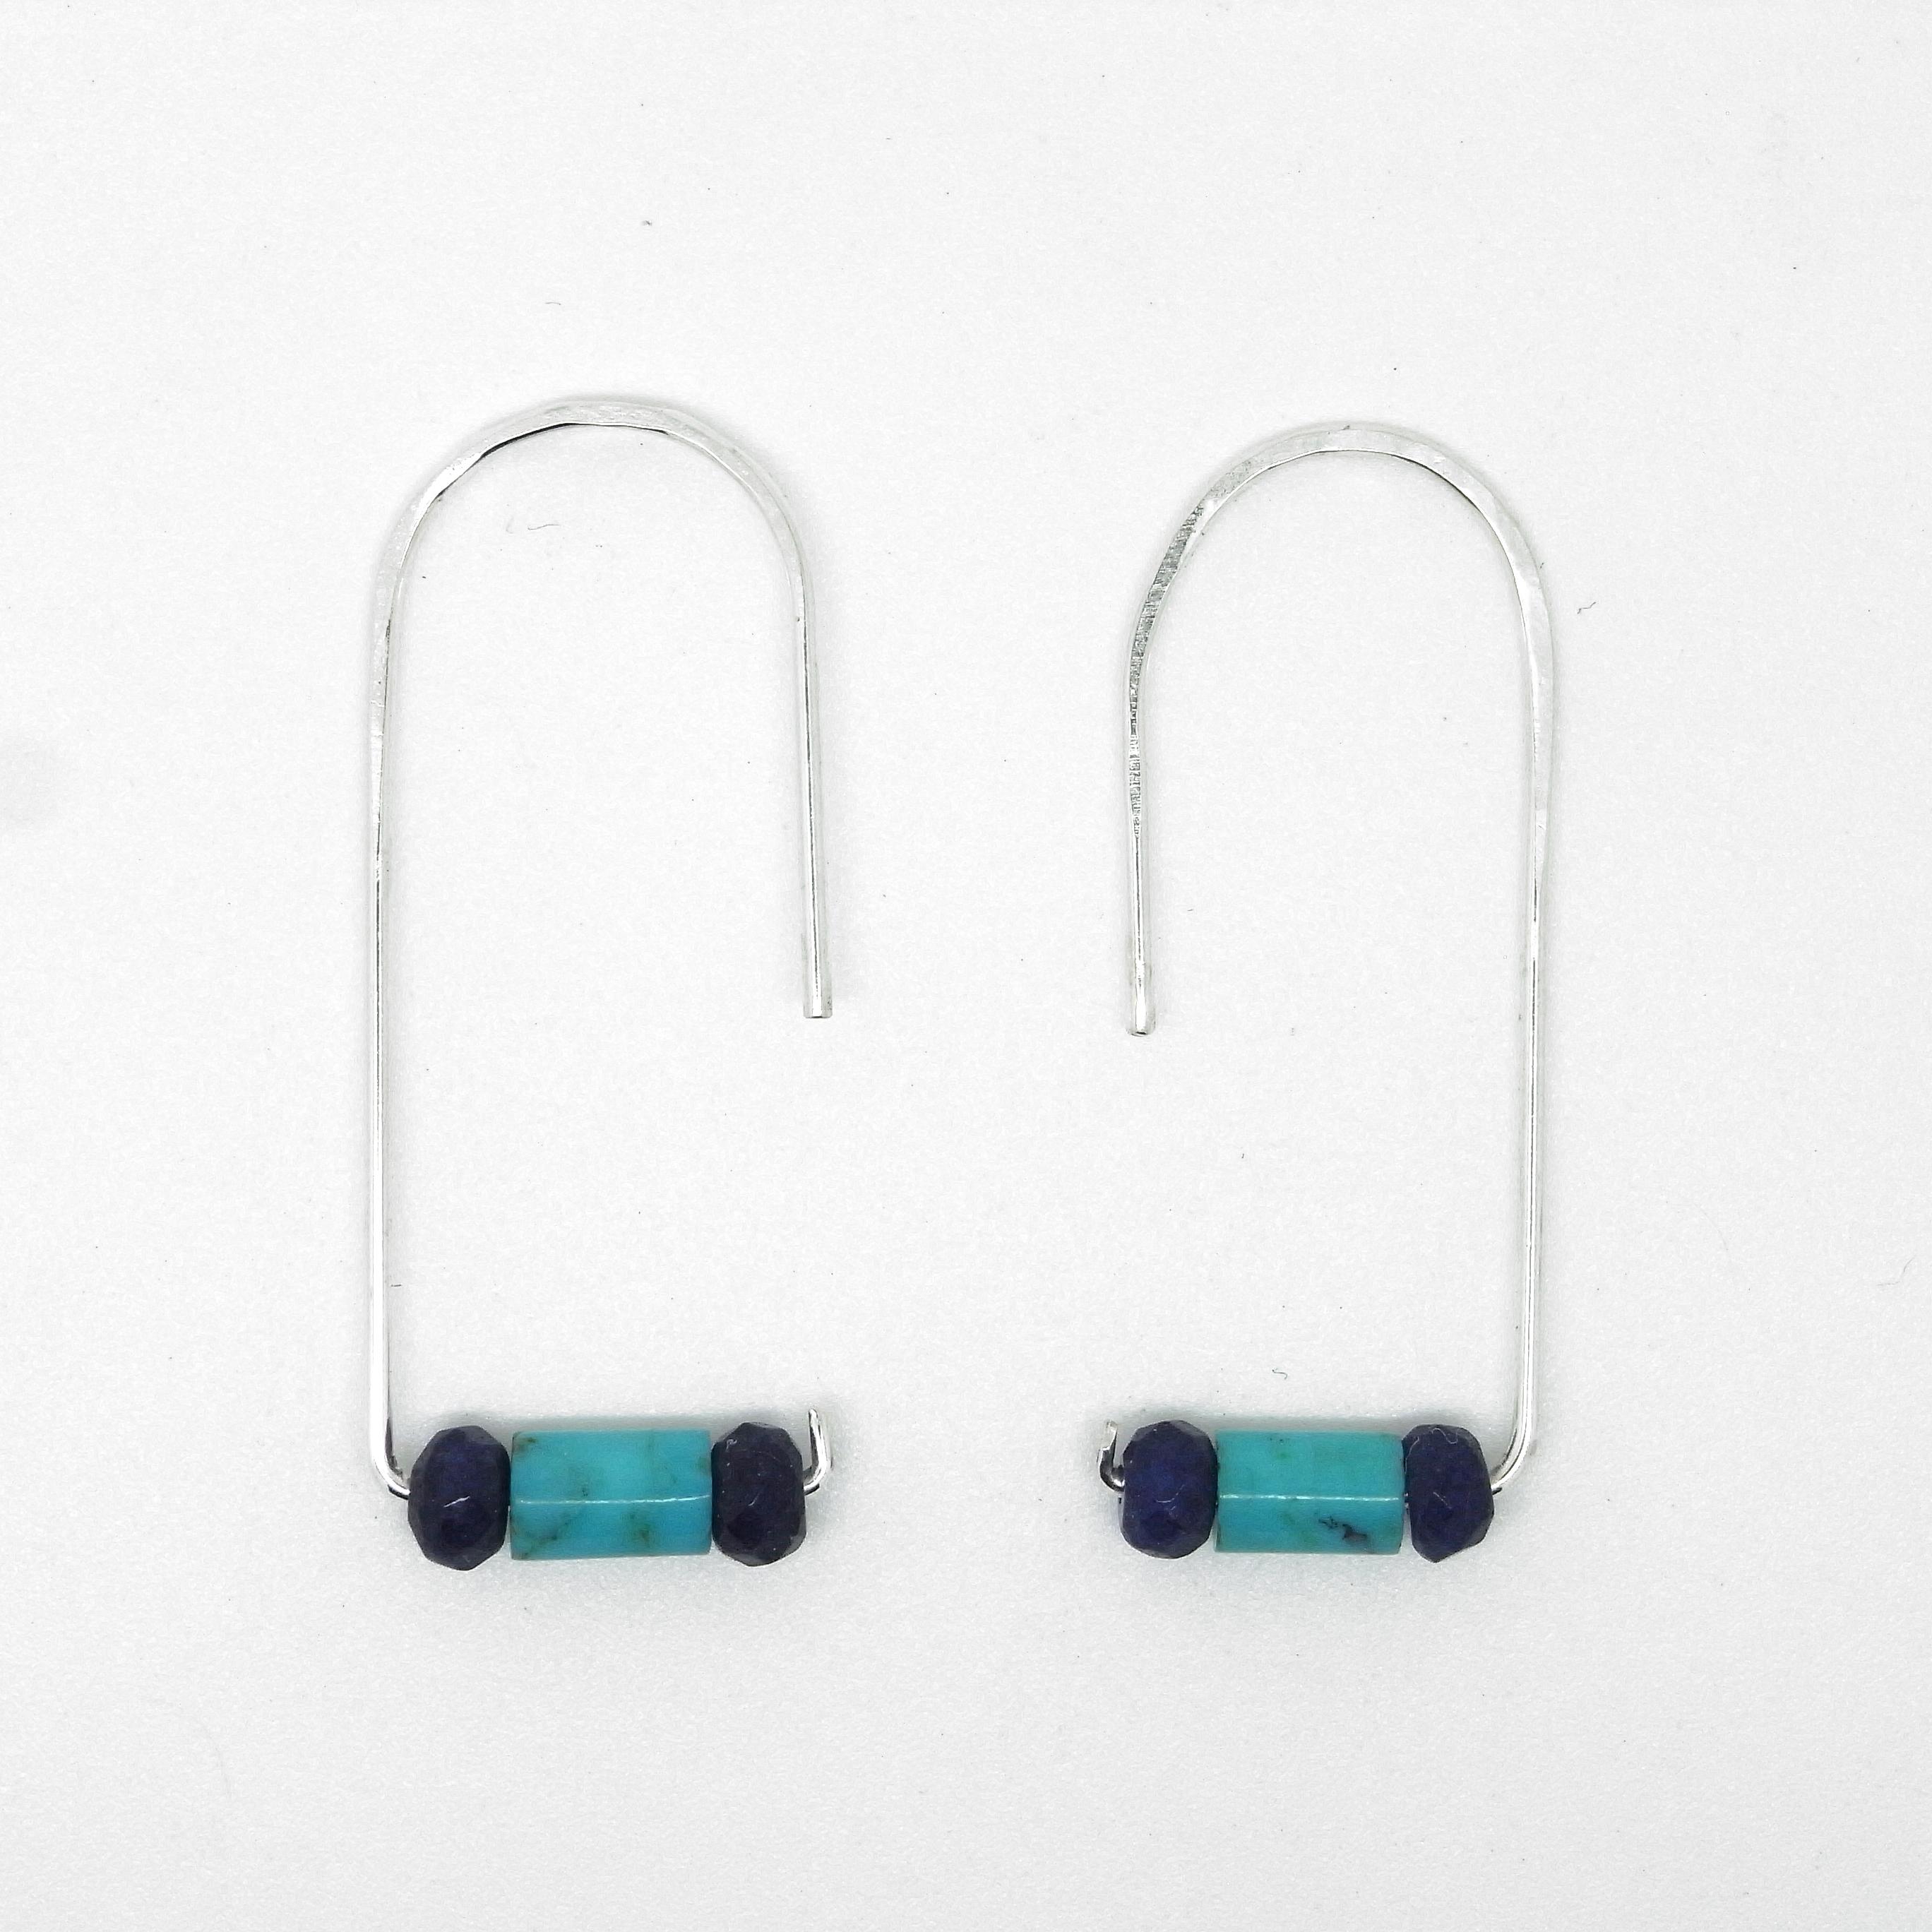 Semi Precious Earrings - Turquoise & Lapis